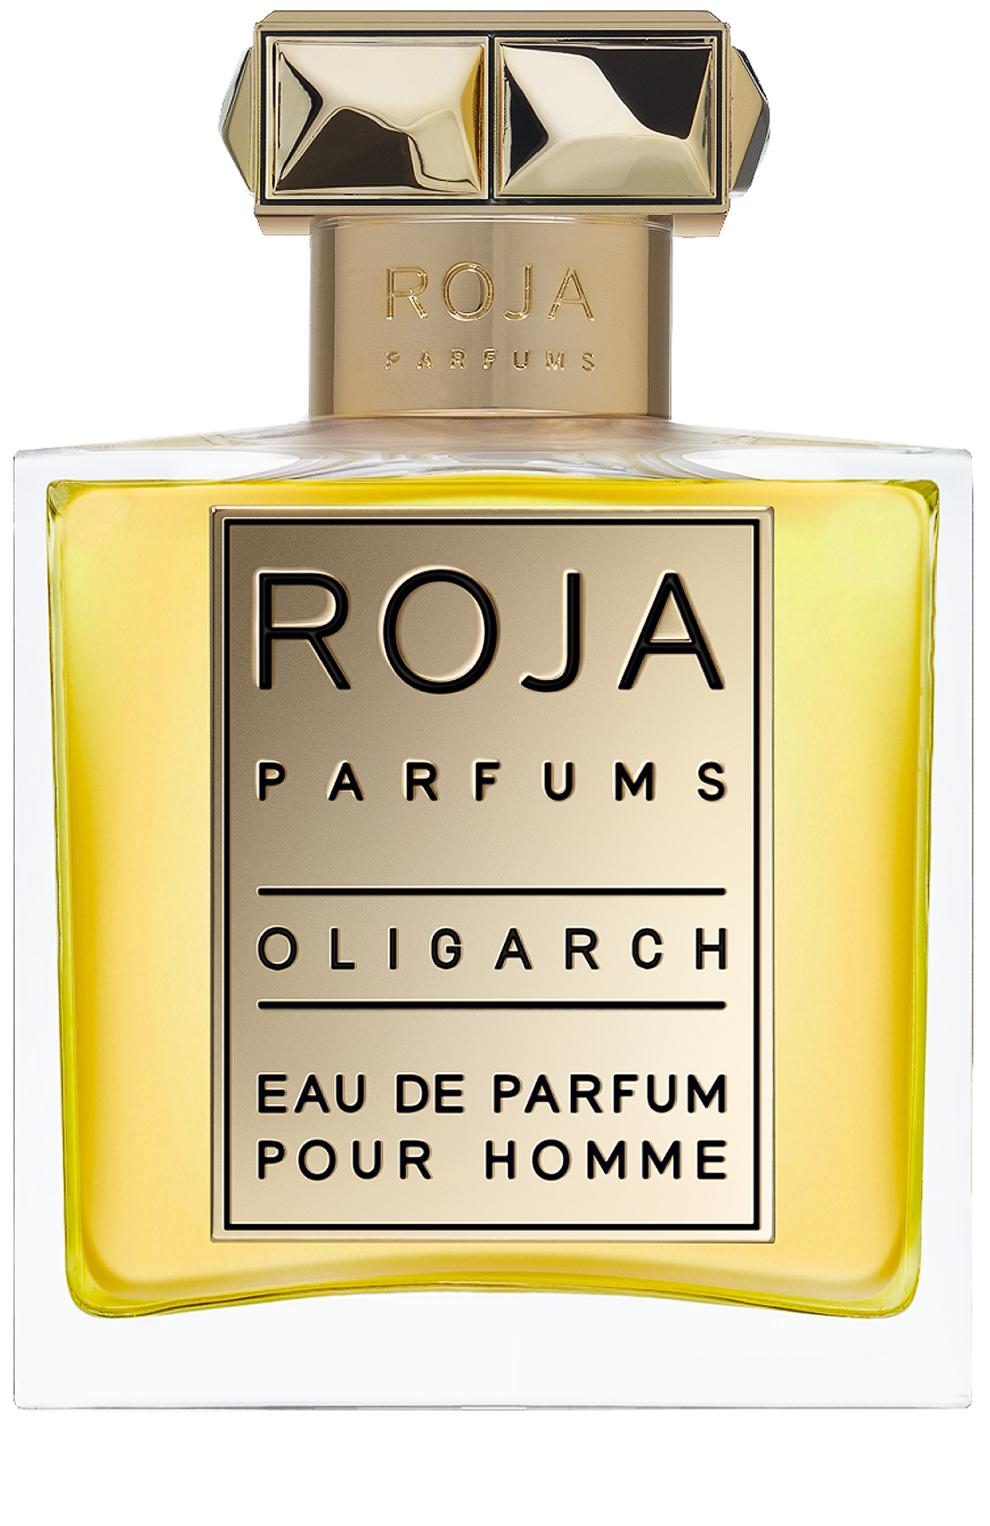 OLIGARCH by ROJA DOVE 5ml Travel Spray BERGAMOTE ANISE BIRCH VANILLA Perfume